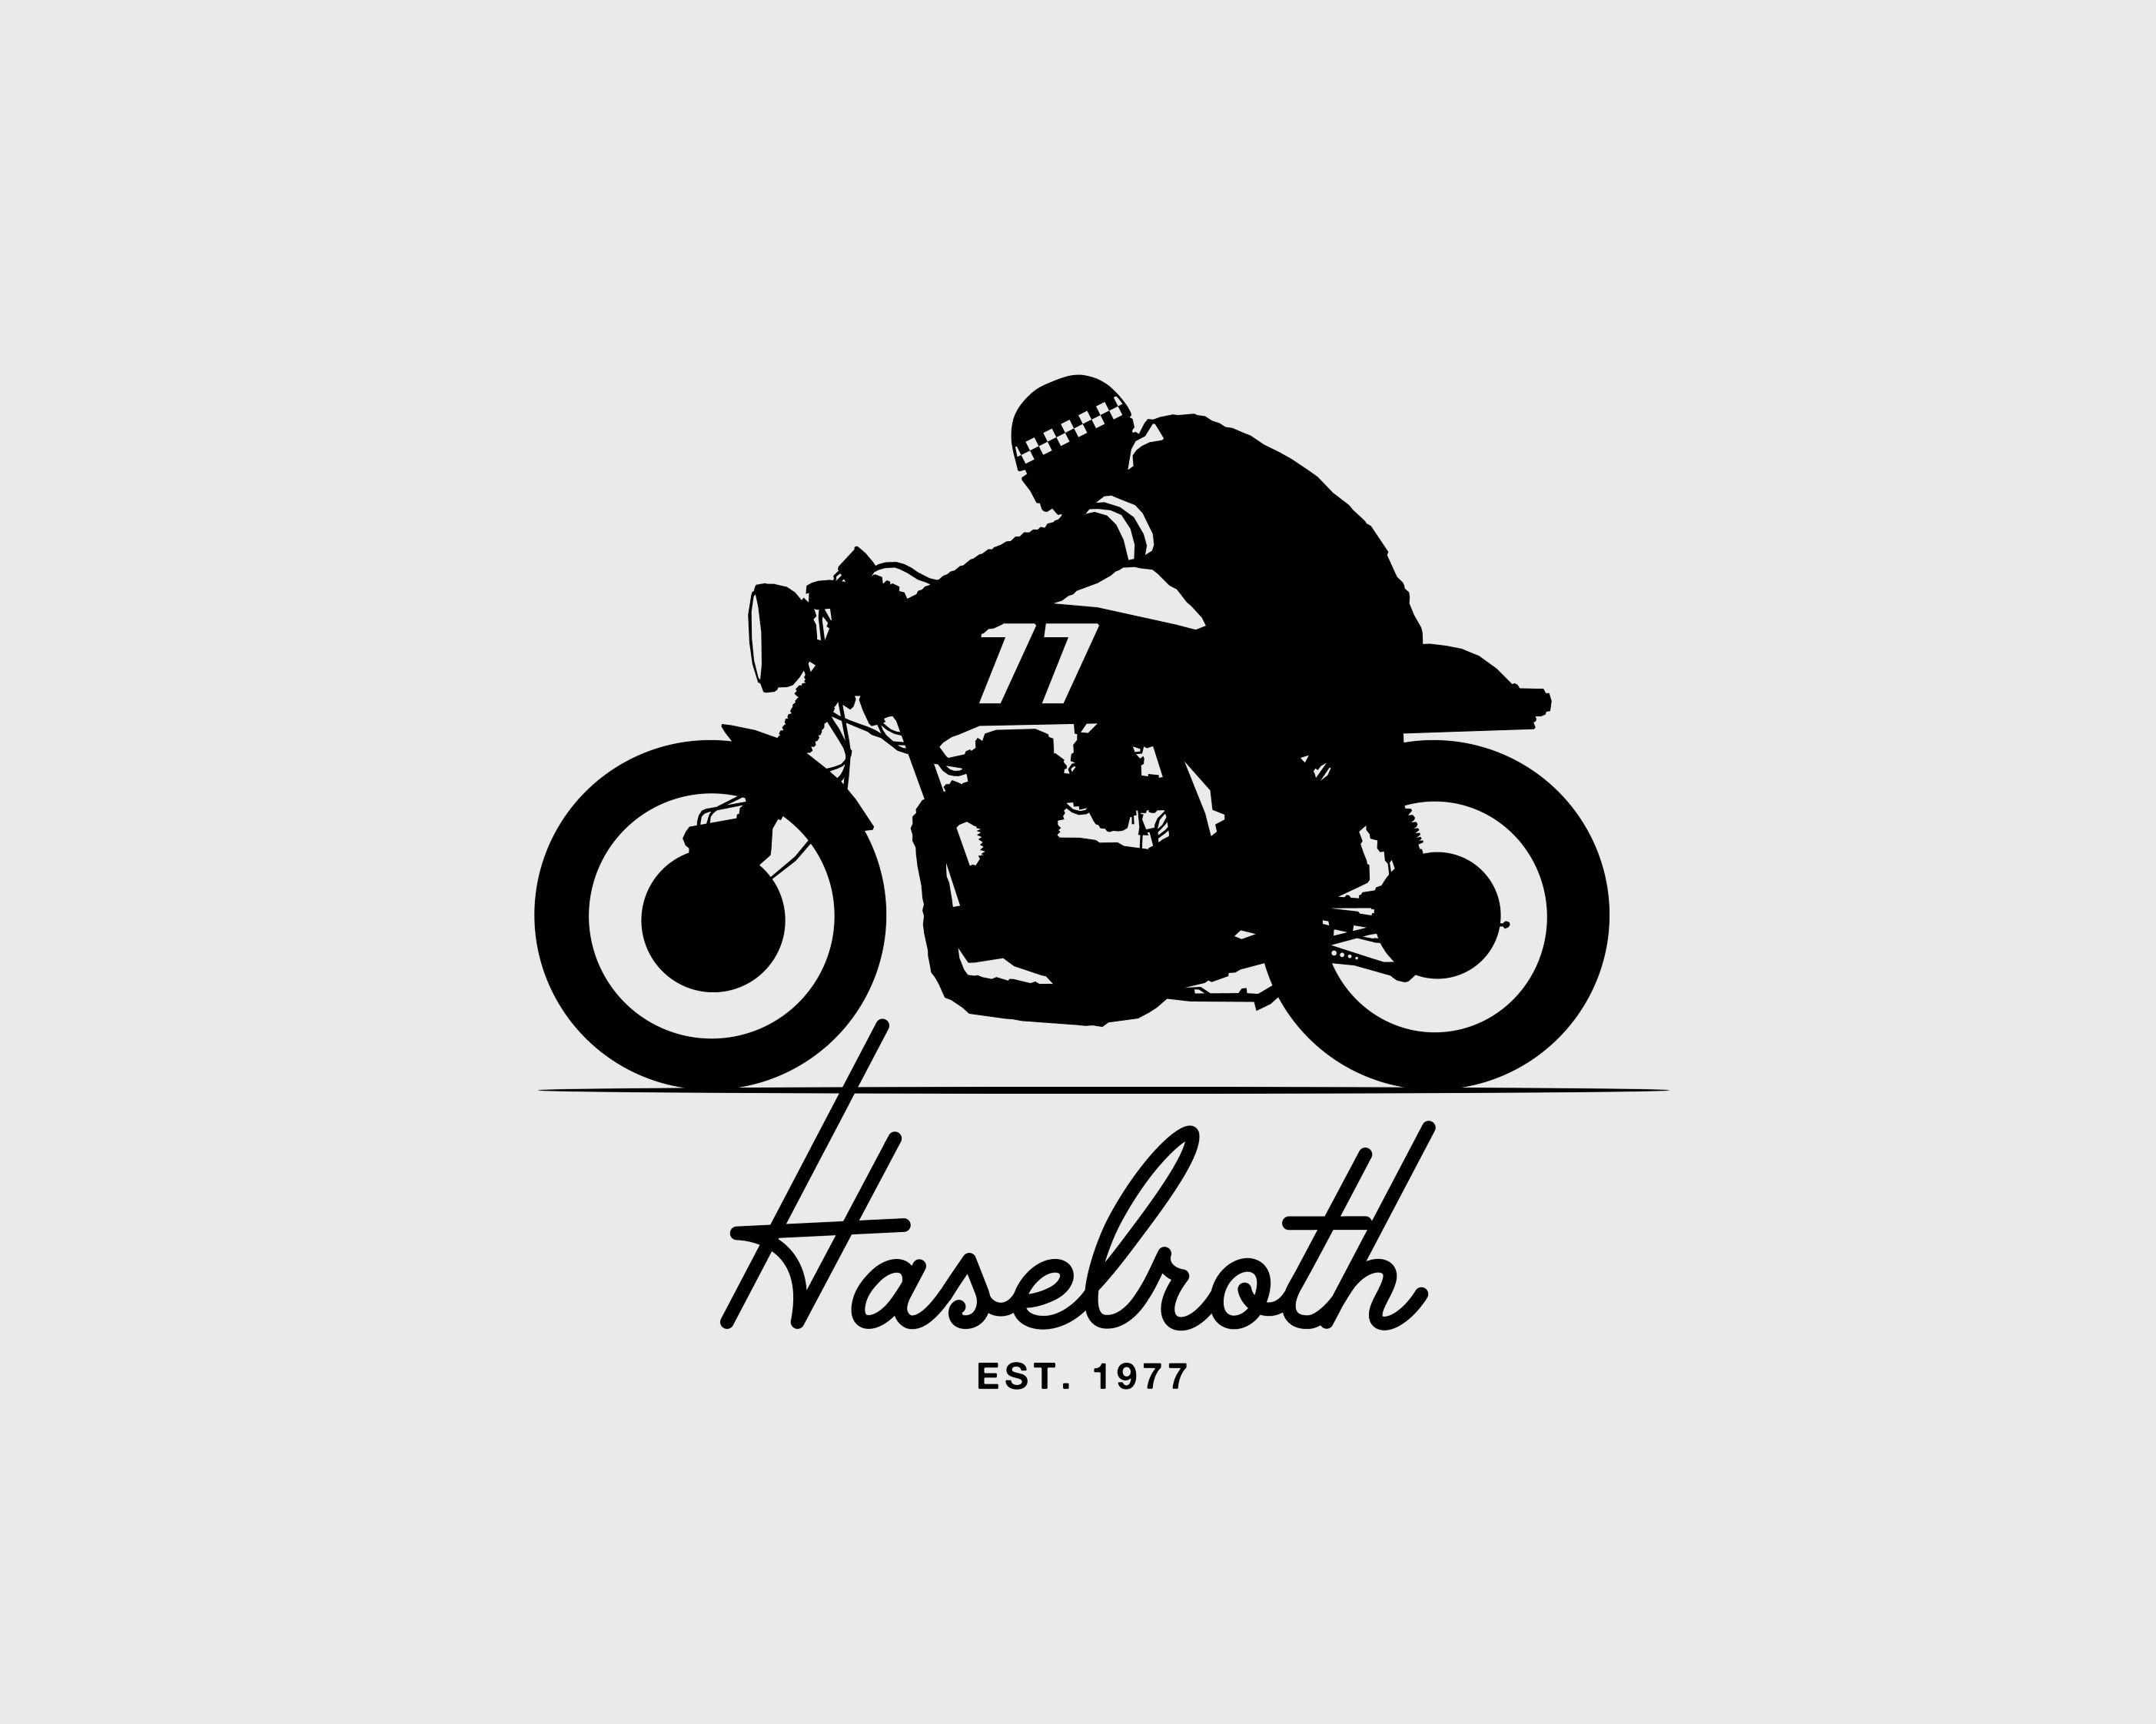 HASELROTH Motorradbekleidung